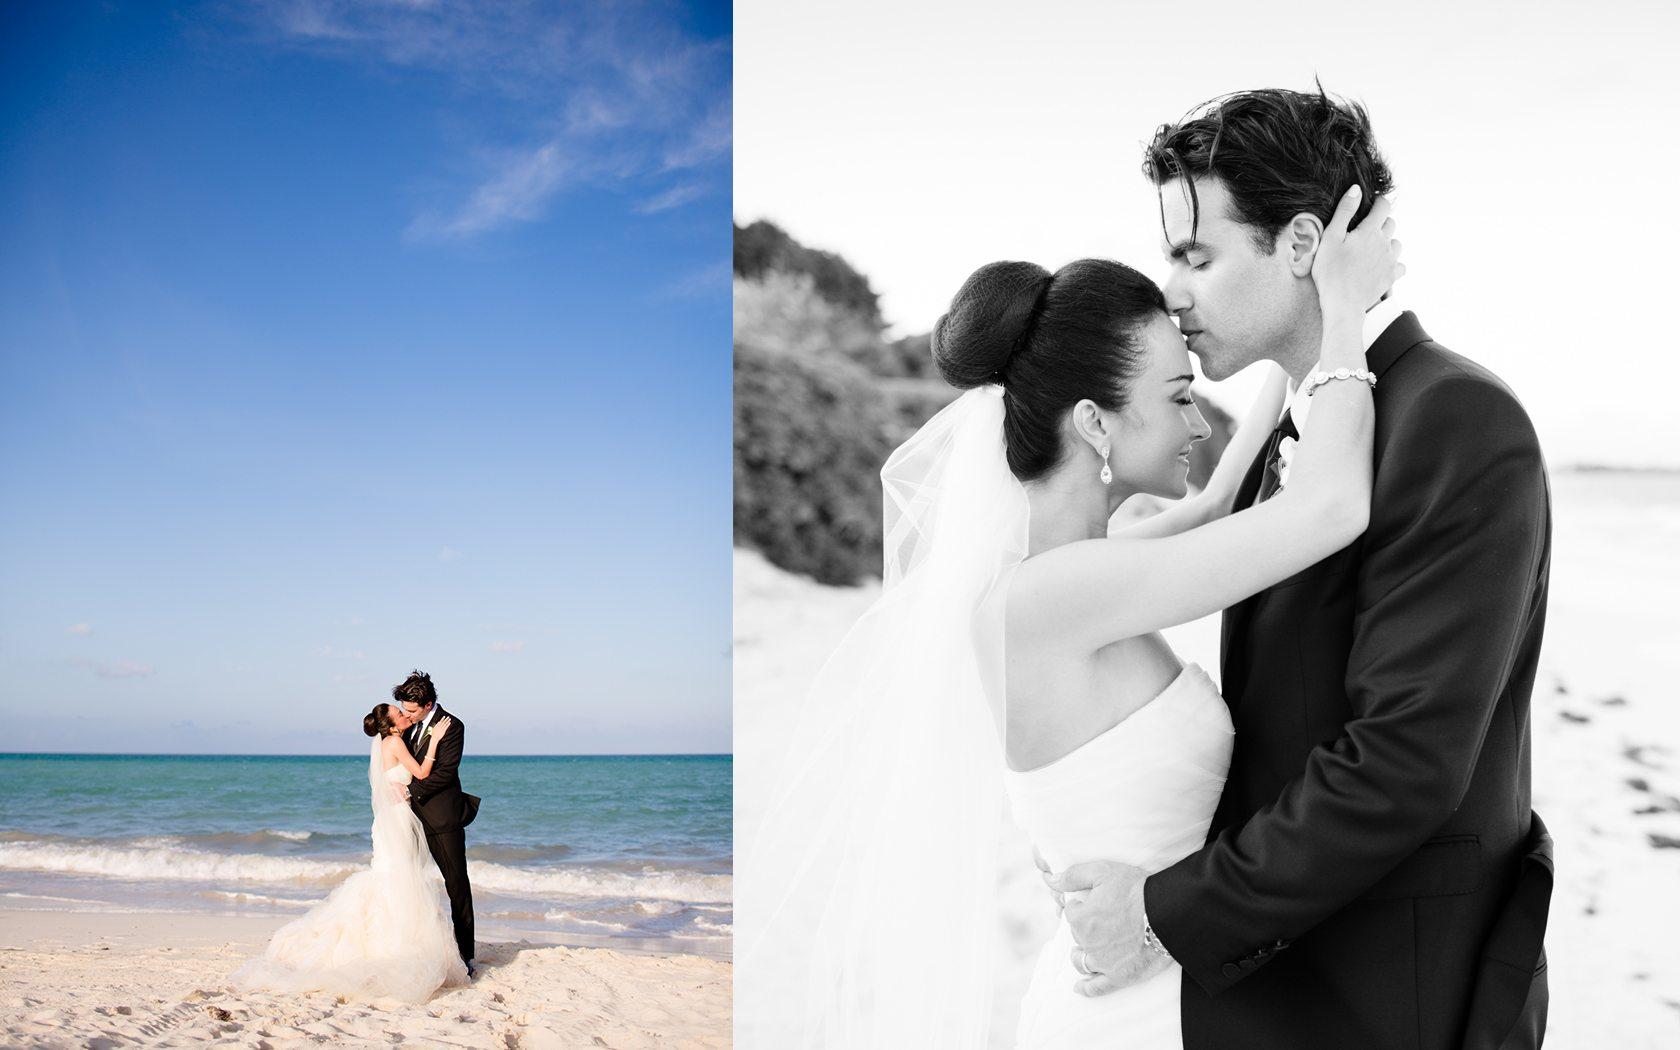 Fairmont_Mayakoba_Wedding_007.jpg